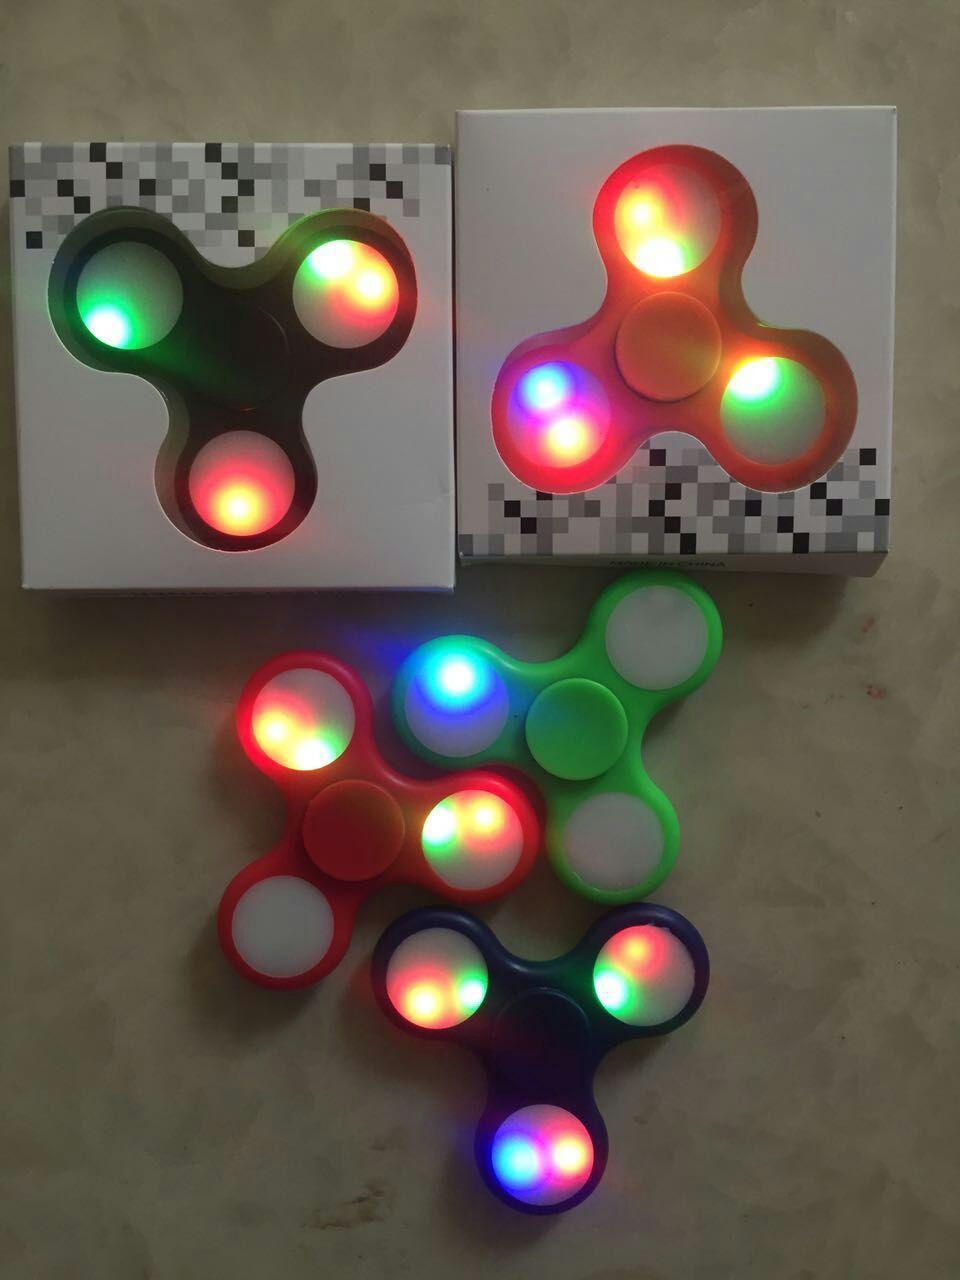 2017 Sıcak Yeni Light up El Spinners LED Parlak Fidget Spinner Üçgen Parmak Spinner Renkli Çift taraflı ışık Dekompresyon Oyuncaklar